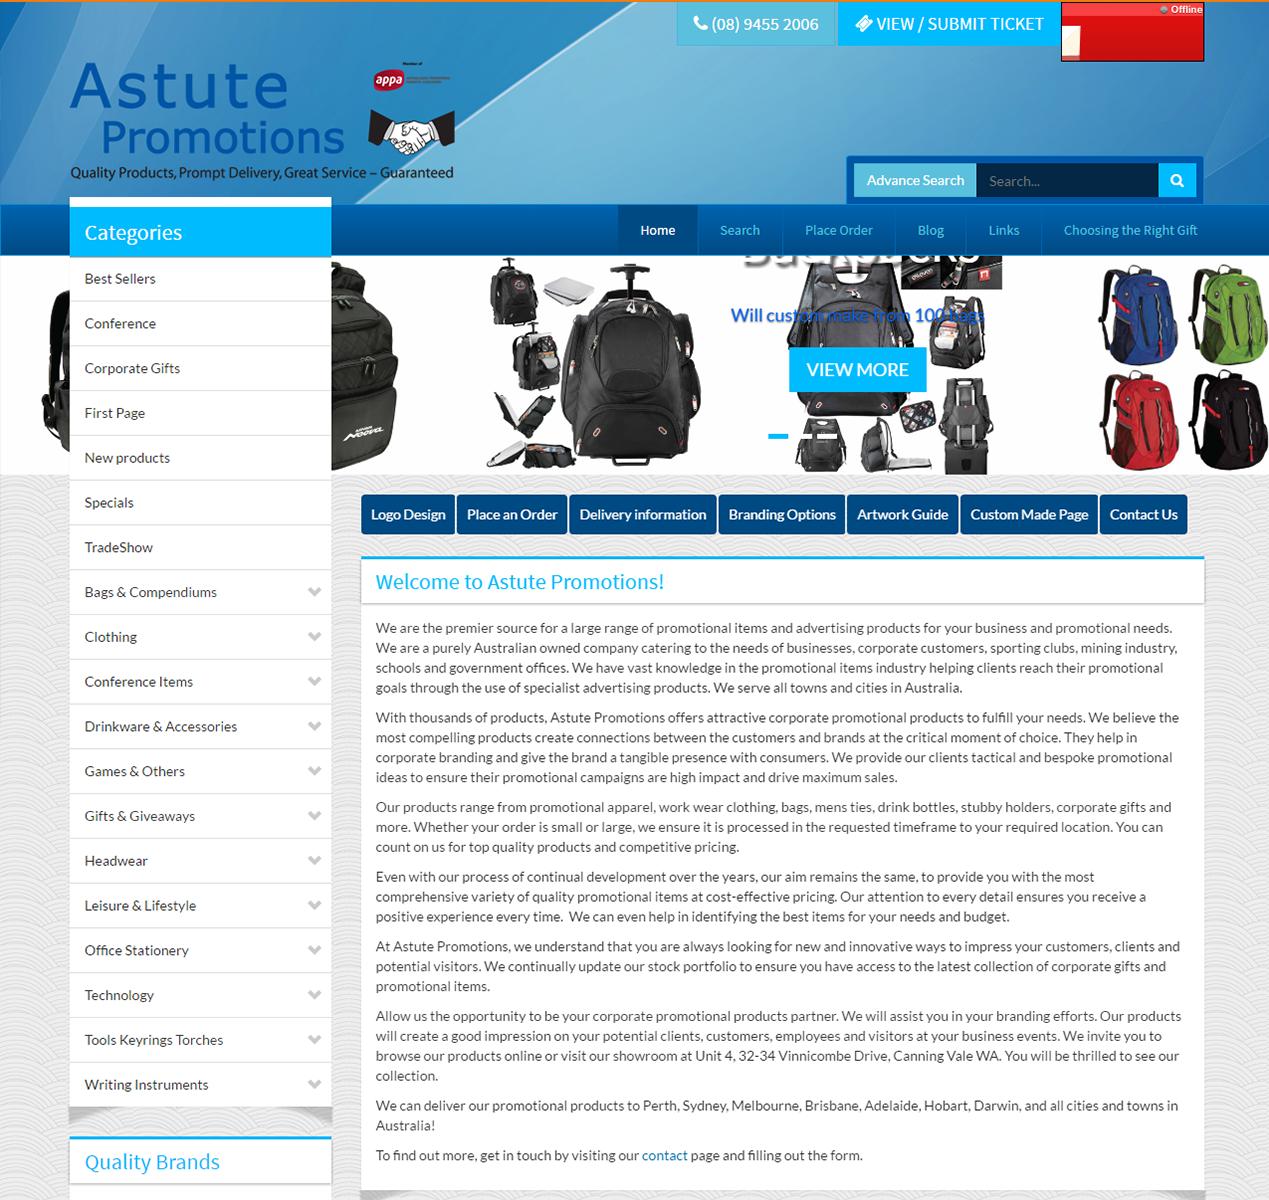 Astute Promotions